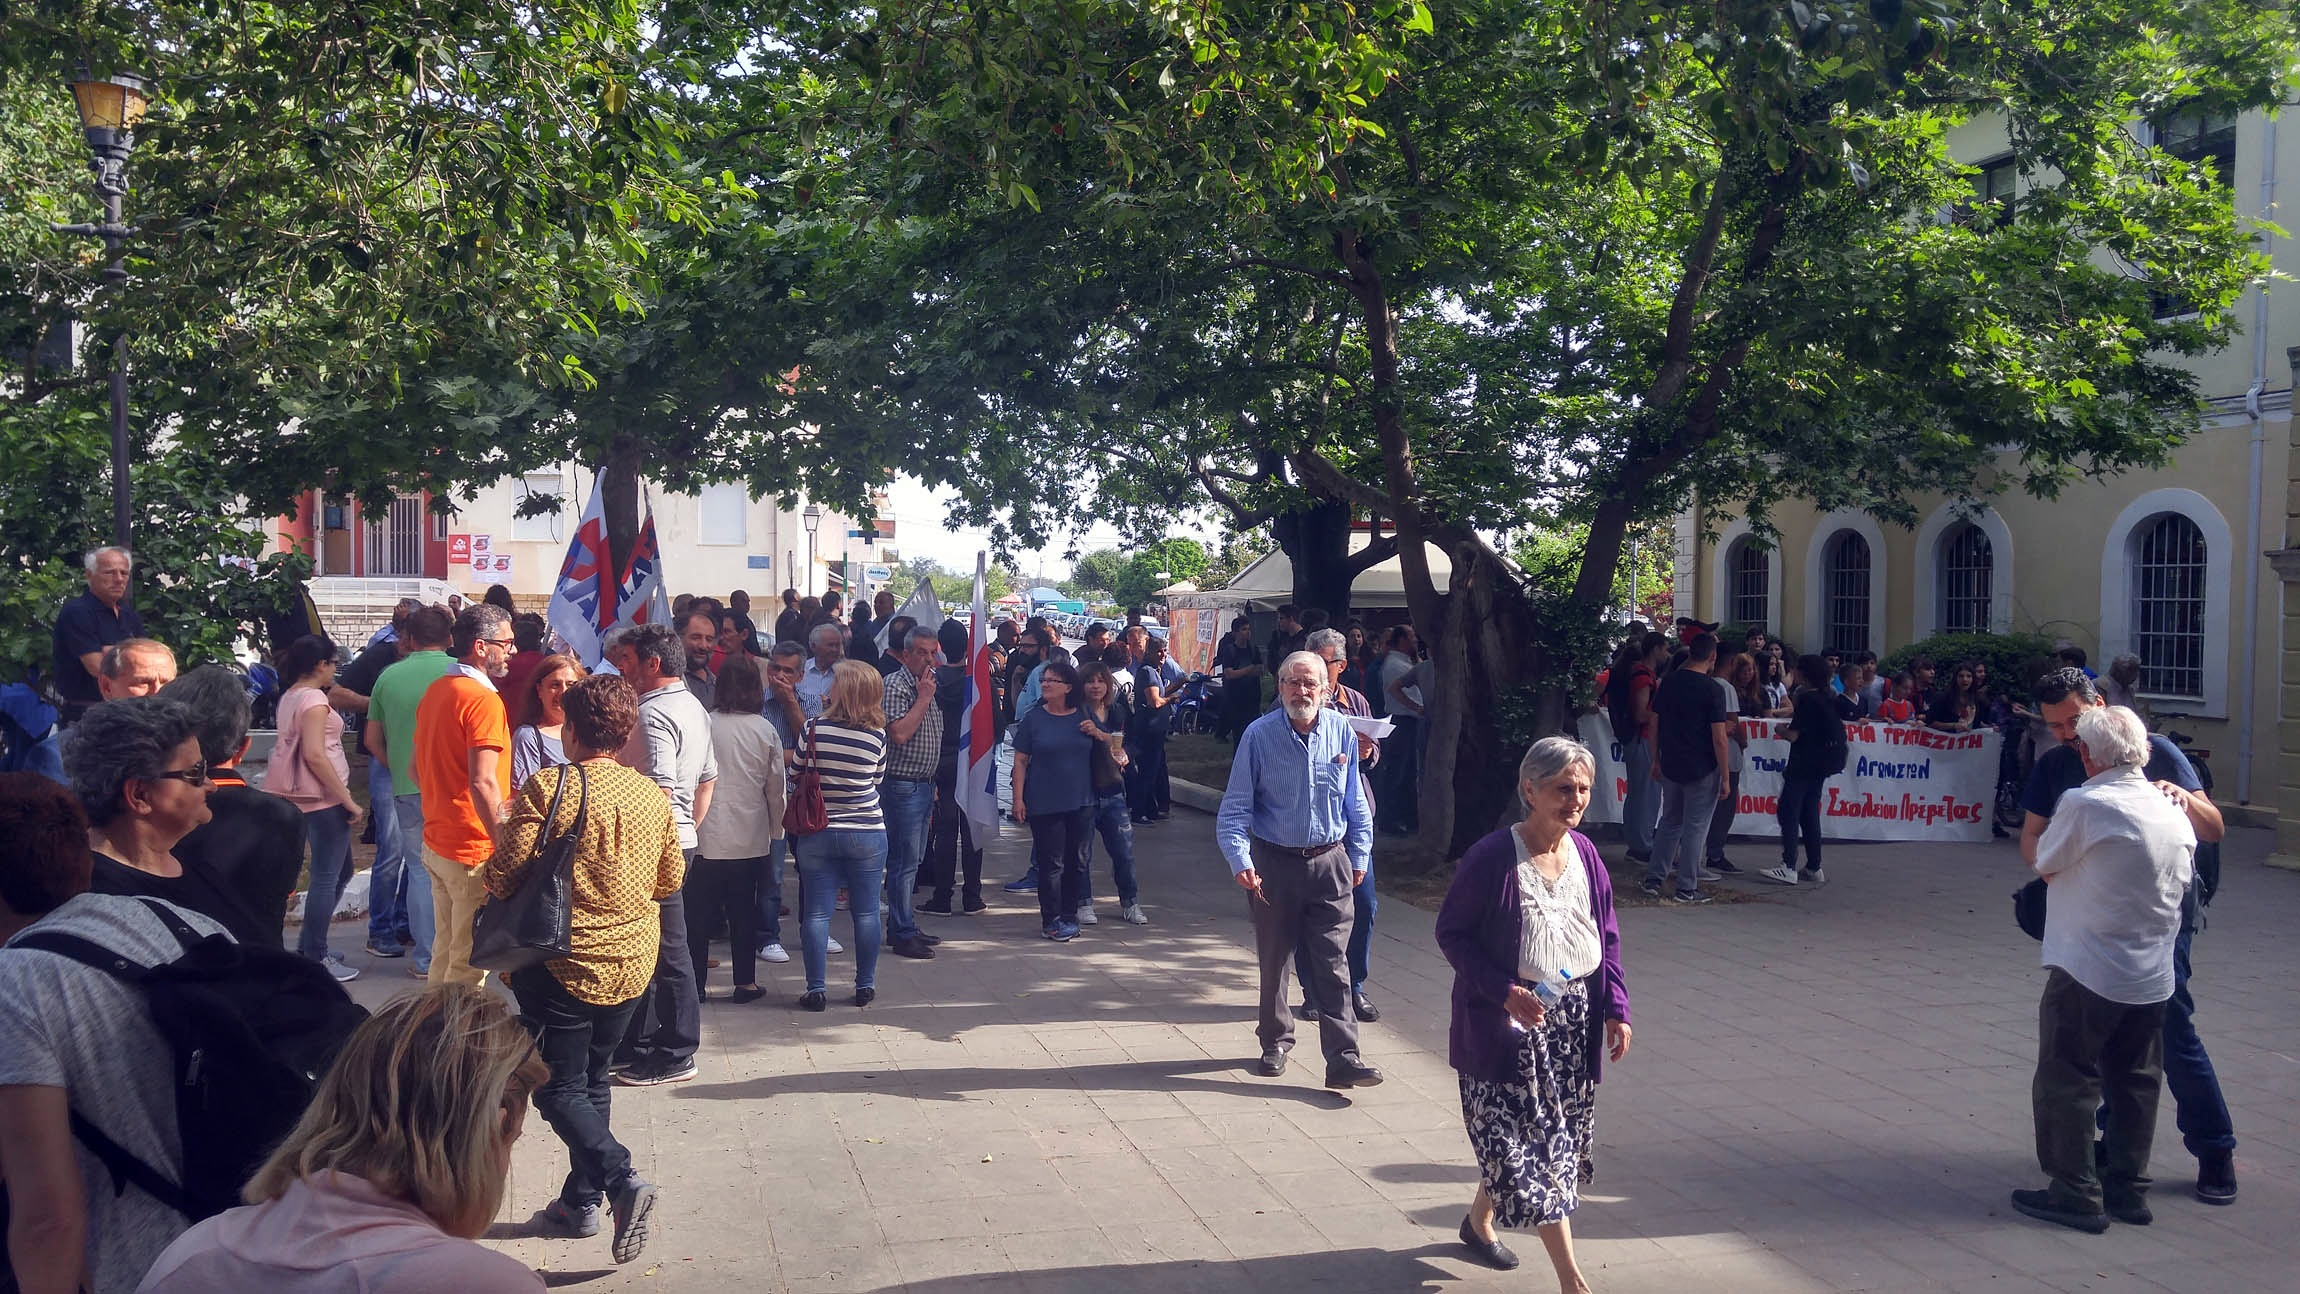 34b8894eae Σε συγκέντρωση διαμαρτυρίας στα Δικαστήρια Πρέβεζας καλεί την ...